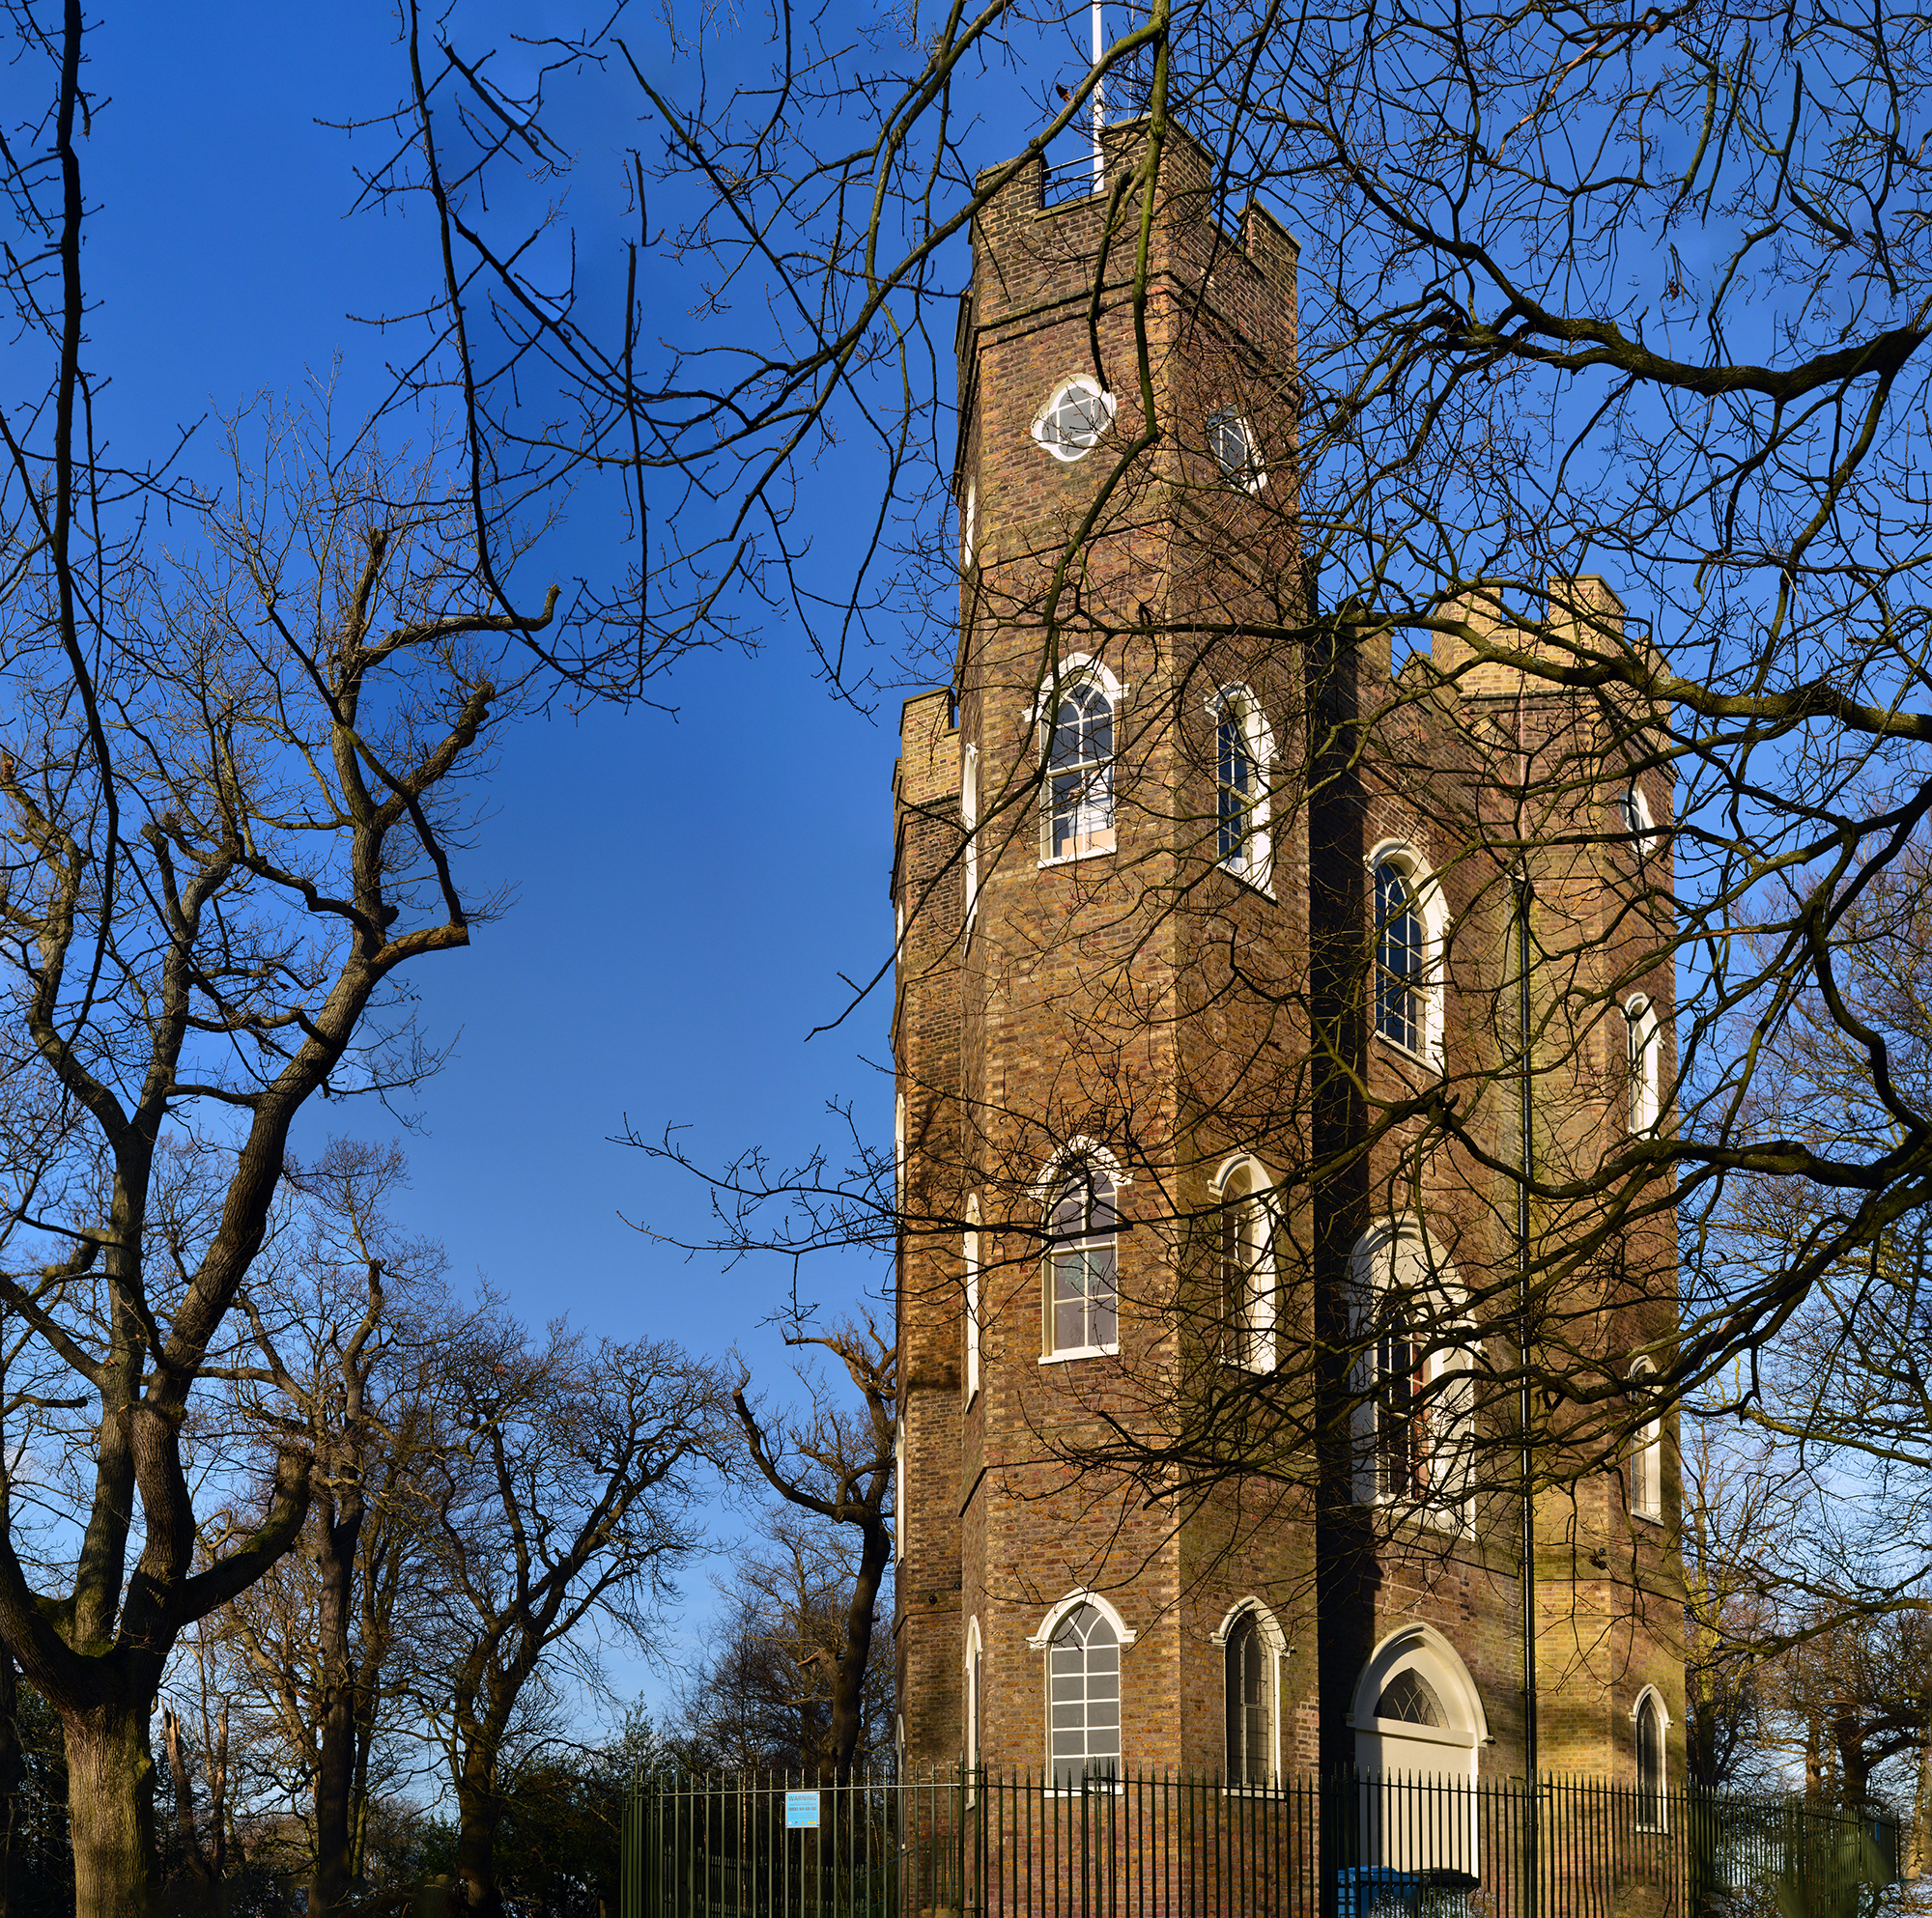 severndroog castle south london club